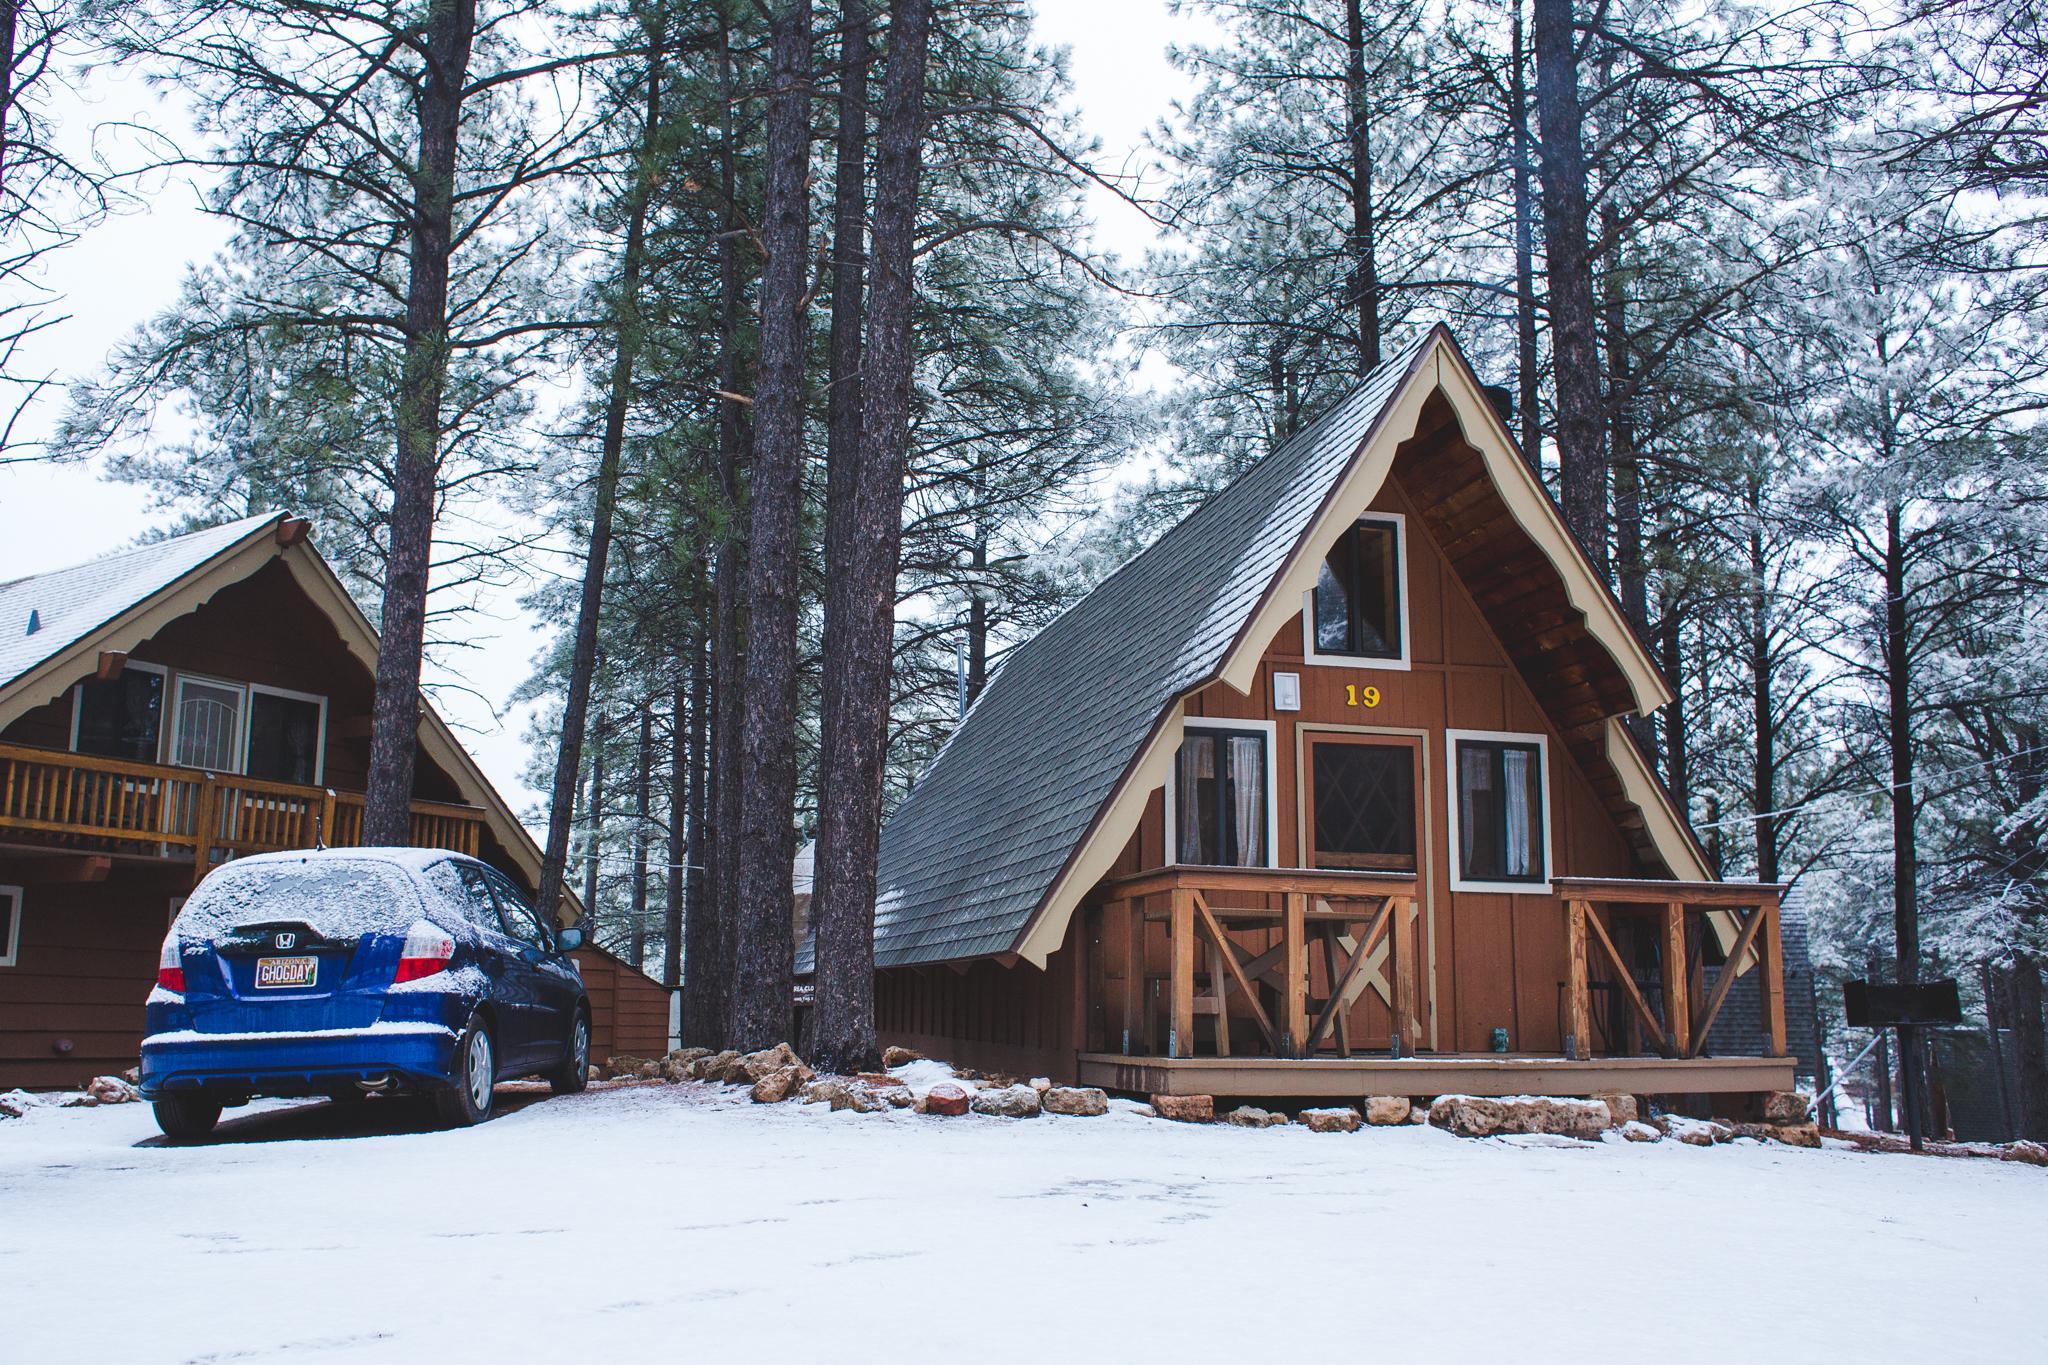 arizona mountain inn and cabins flagstaff number 19